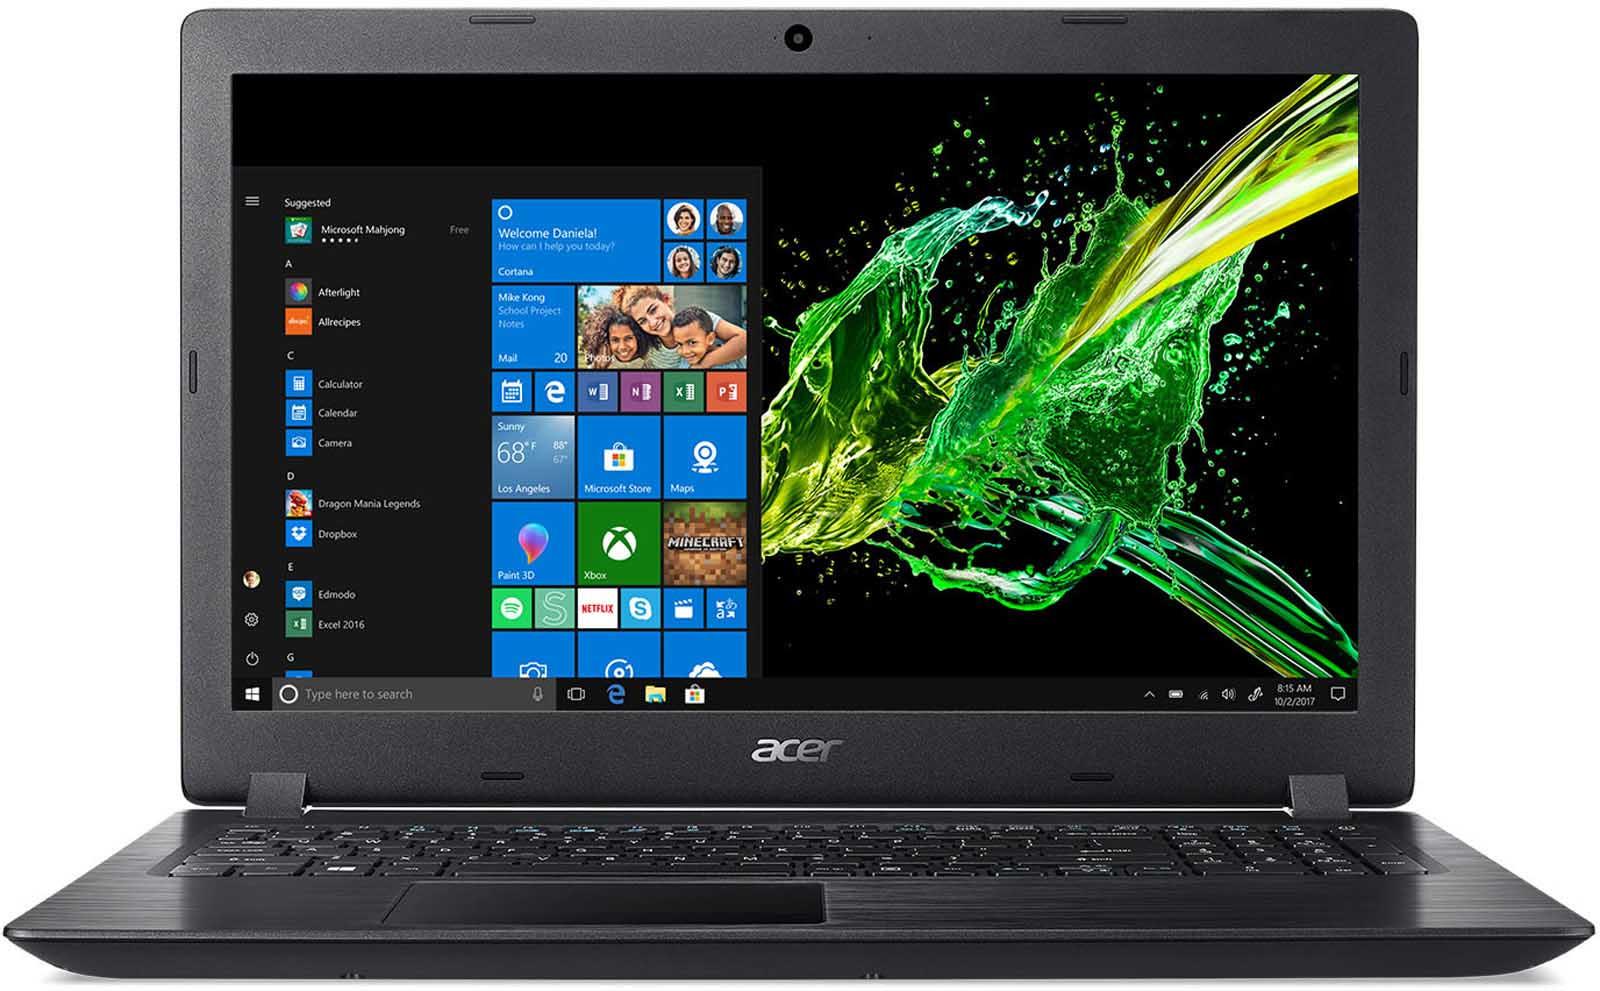 Acer laptop Aspire 3 A315-22-670G